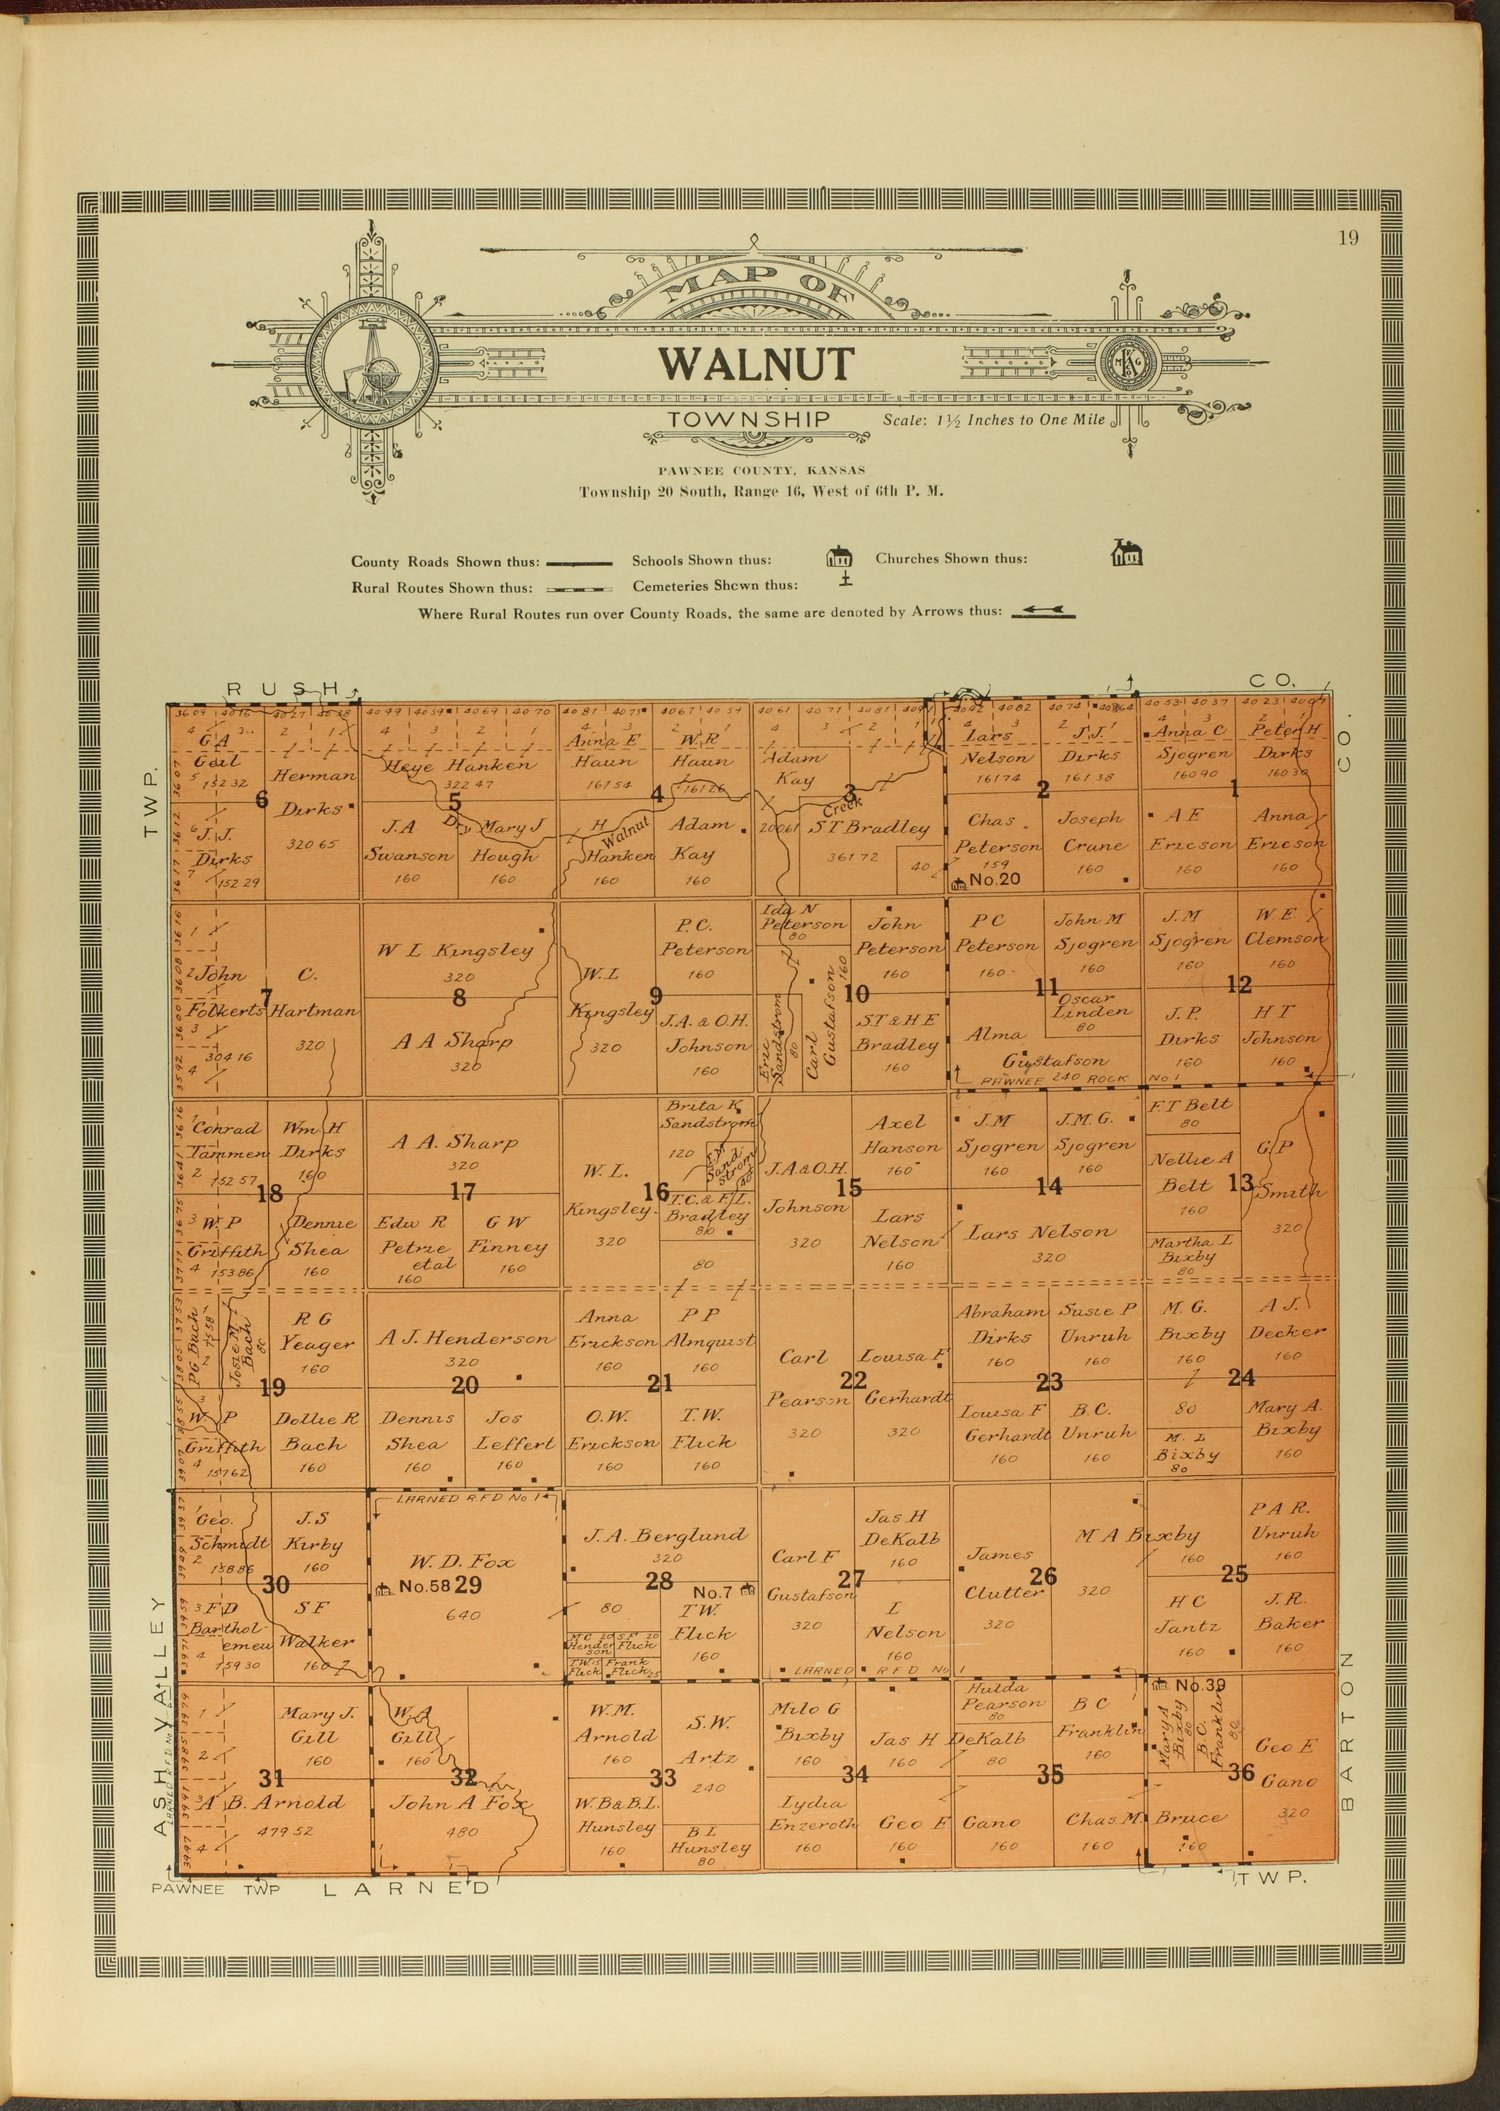 Atlas and plat book of Pawnee County, Kansas - 19